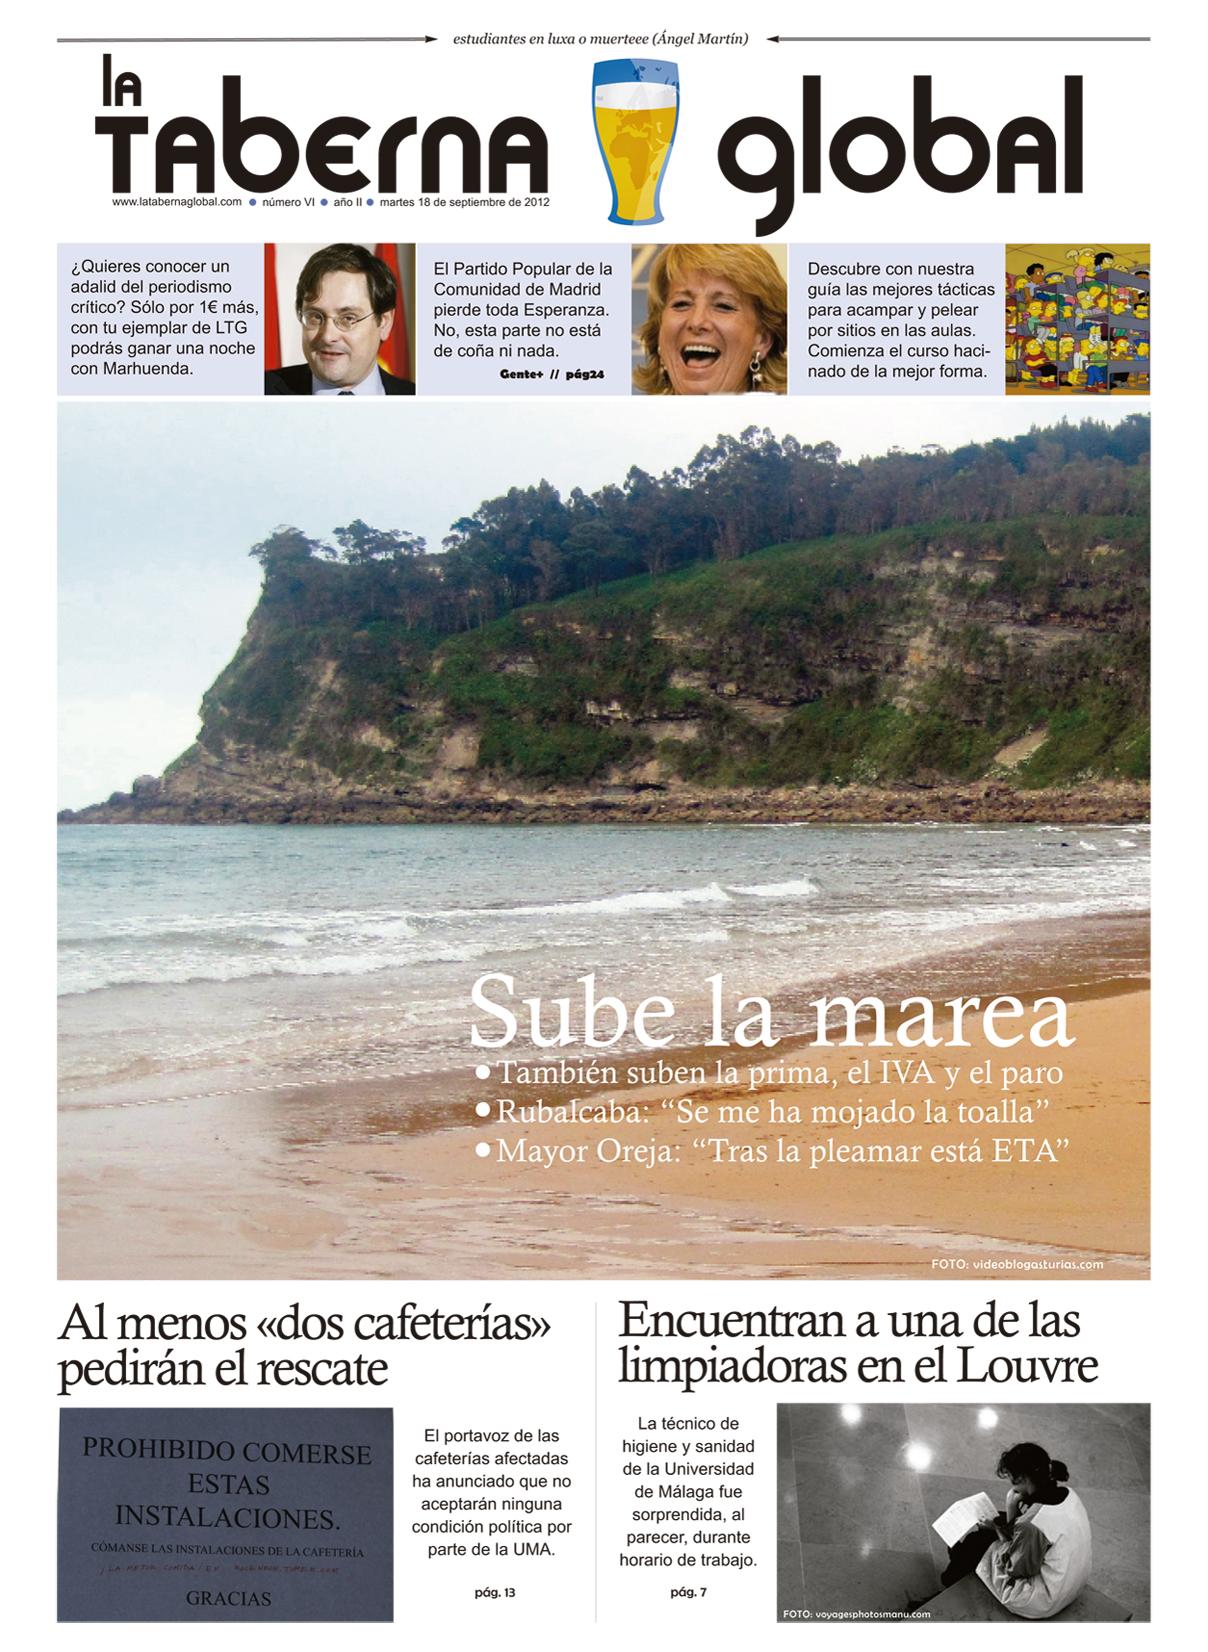 La portada satírica de LTG 18/09/12